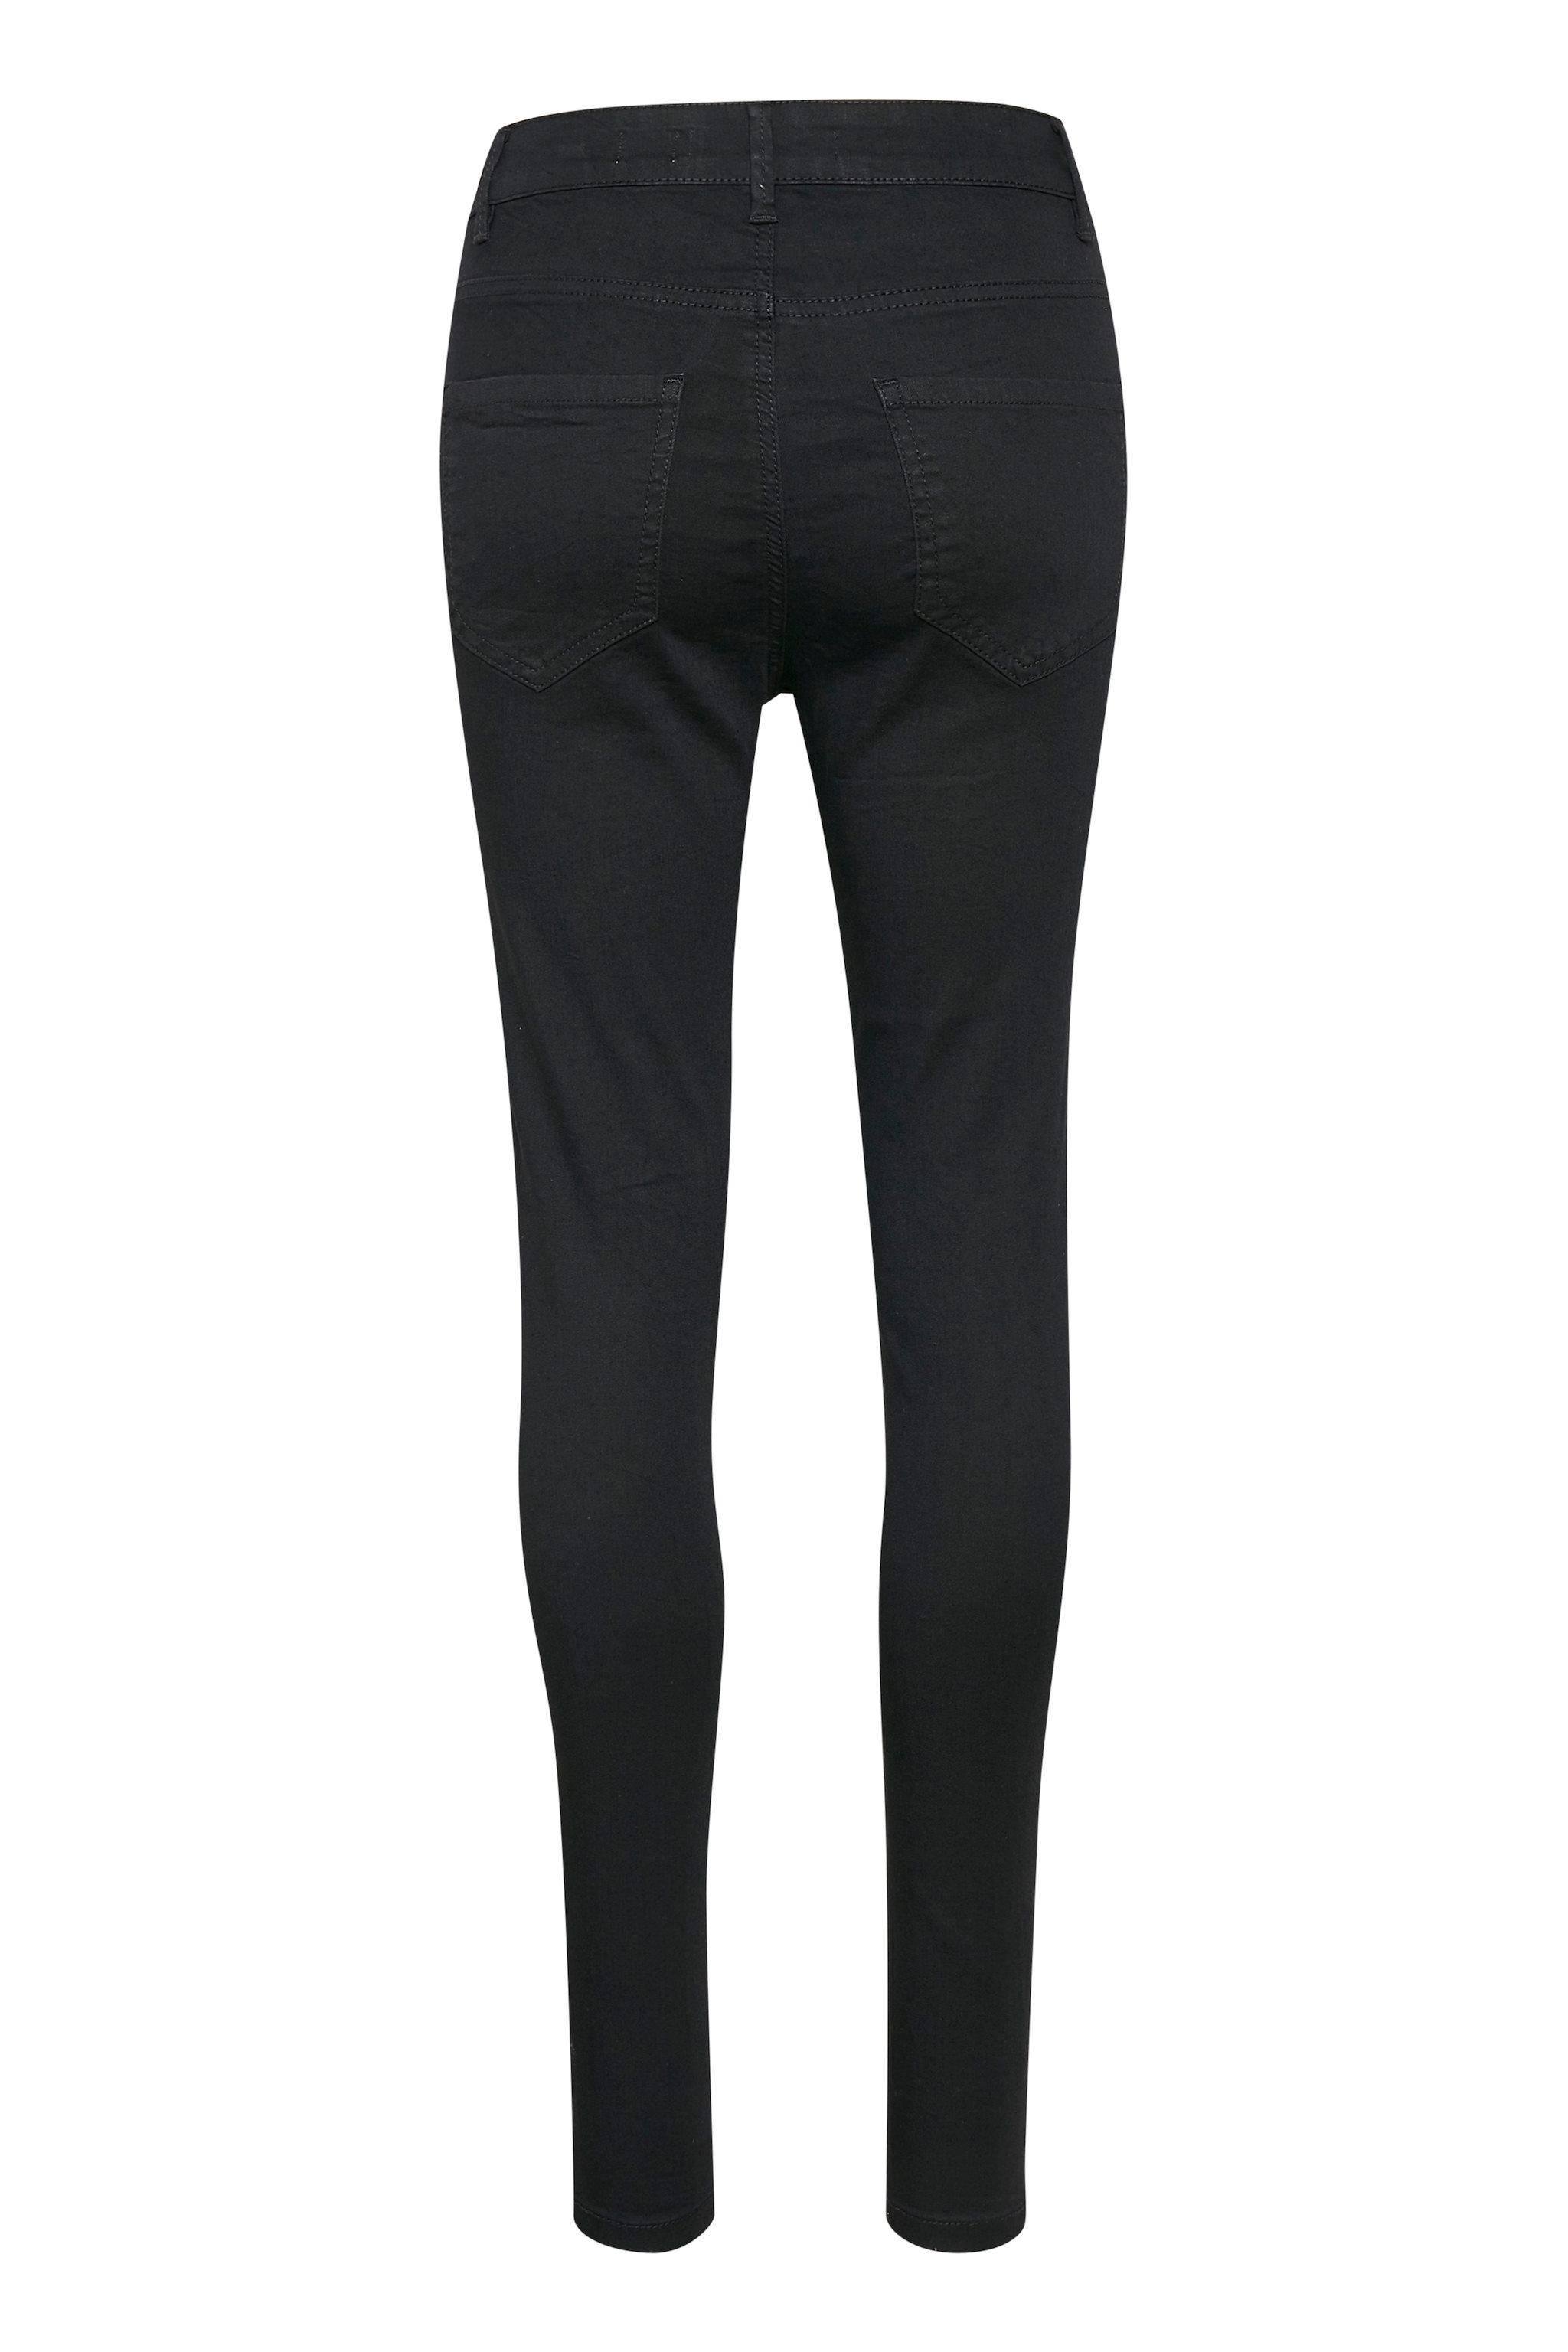 Saint Tropez Jeans, black, x-small